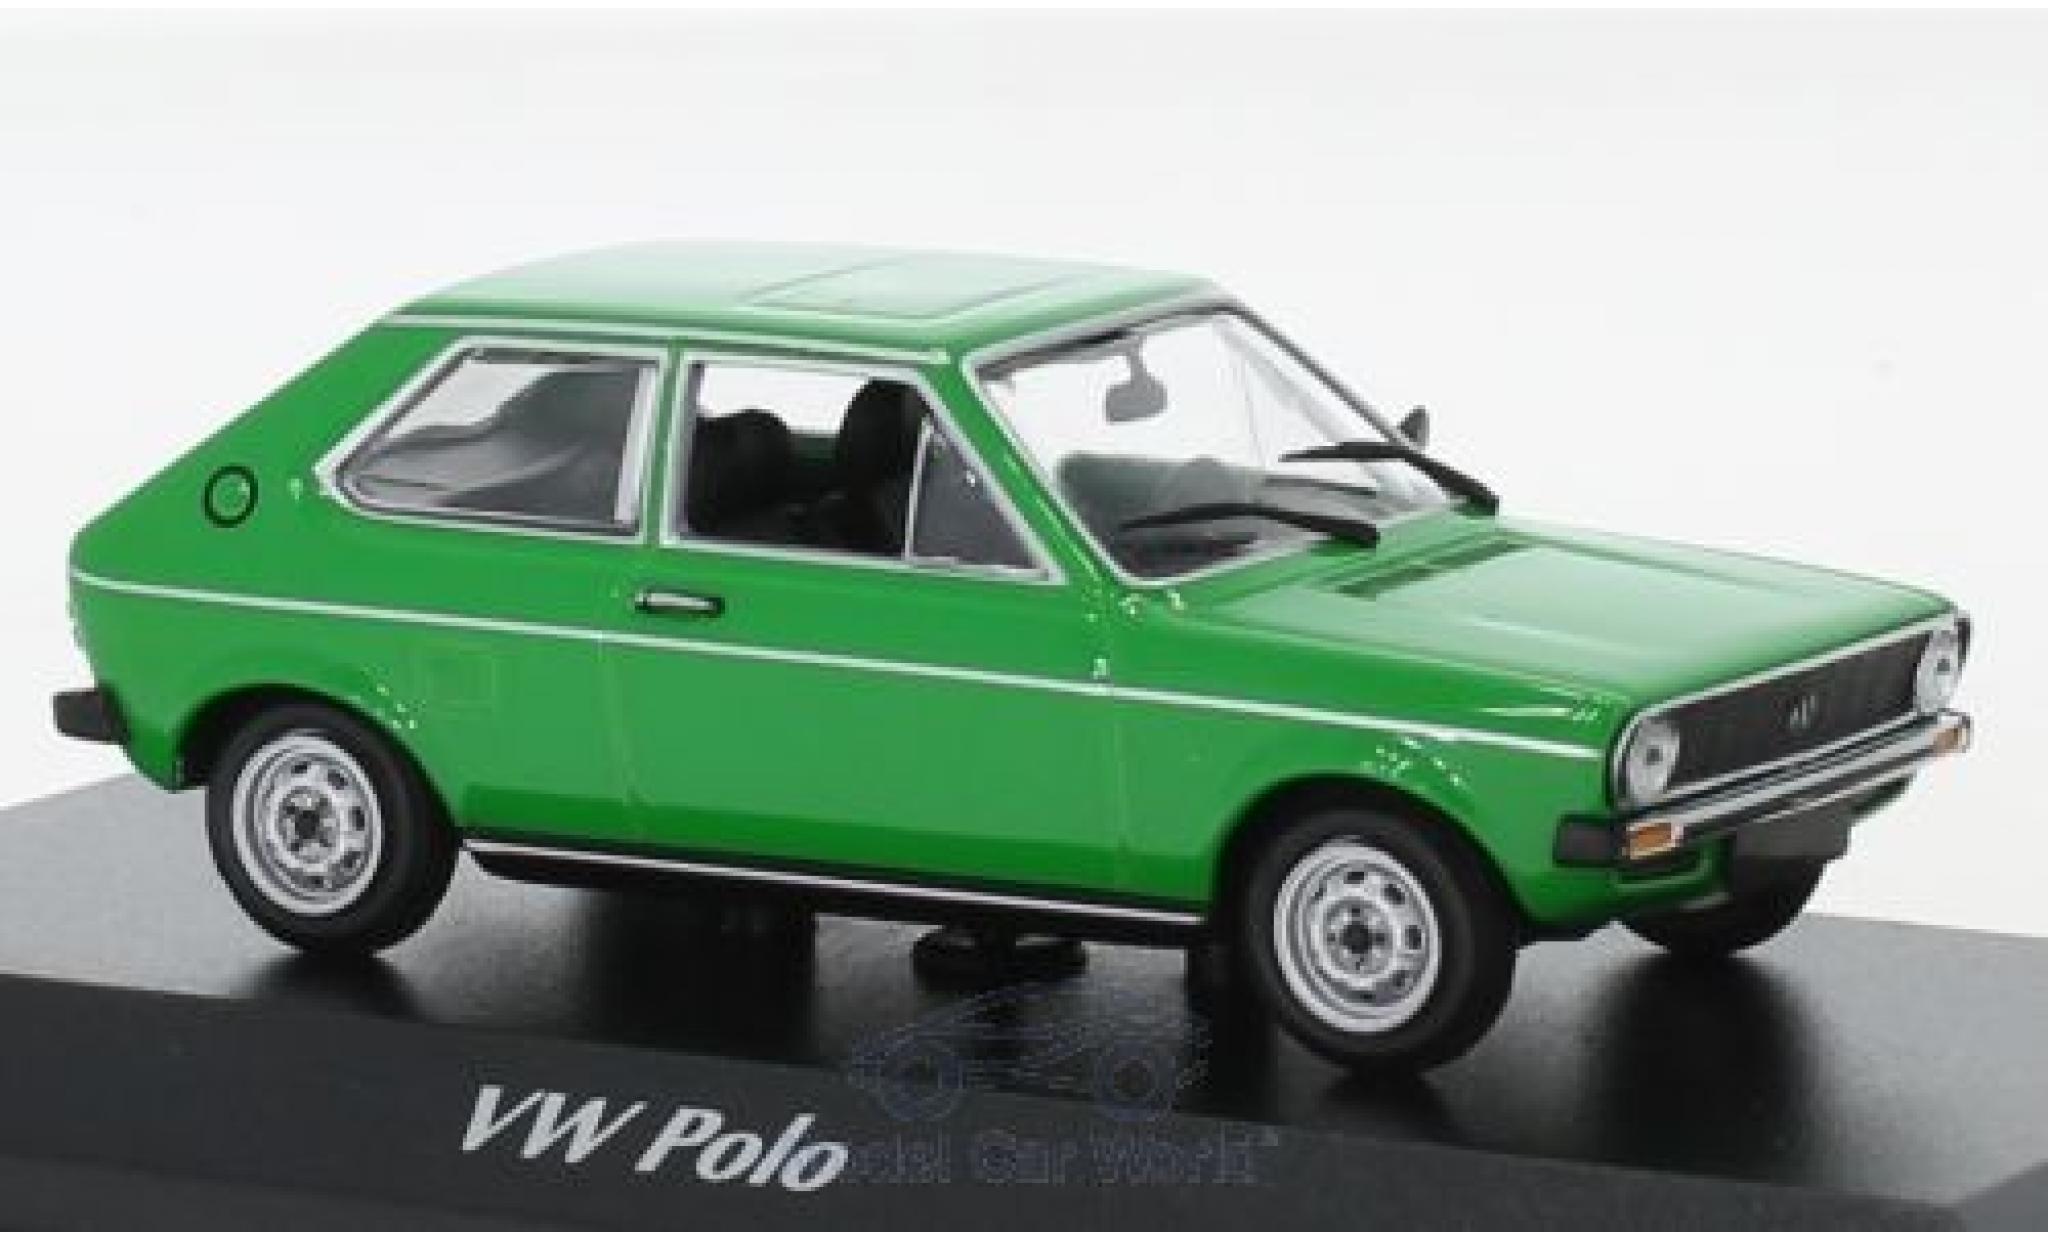 Volkswagen Polo 1/43 Maxichamps verte 1979